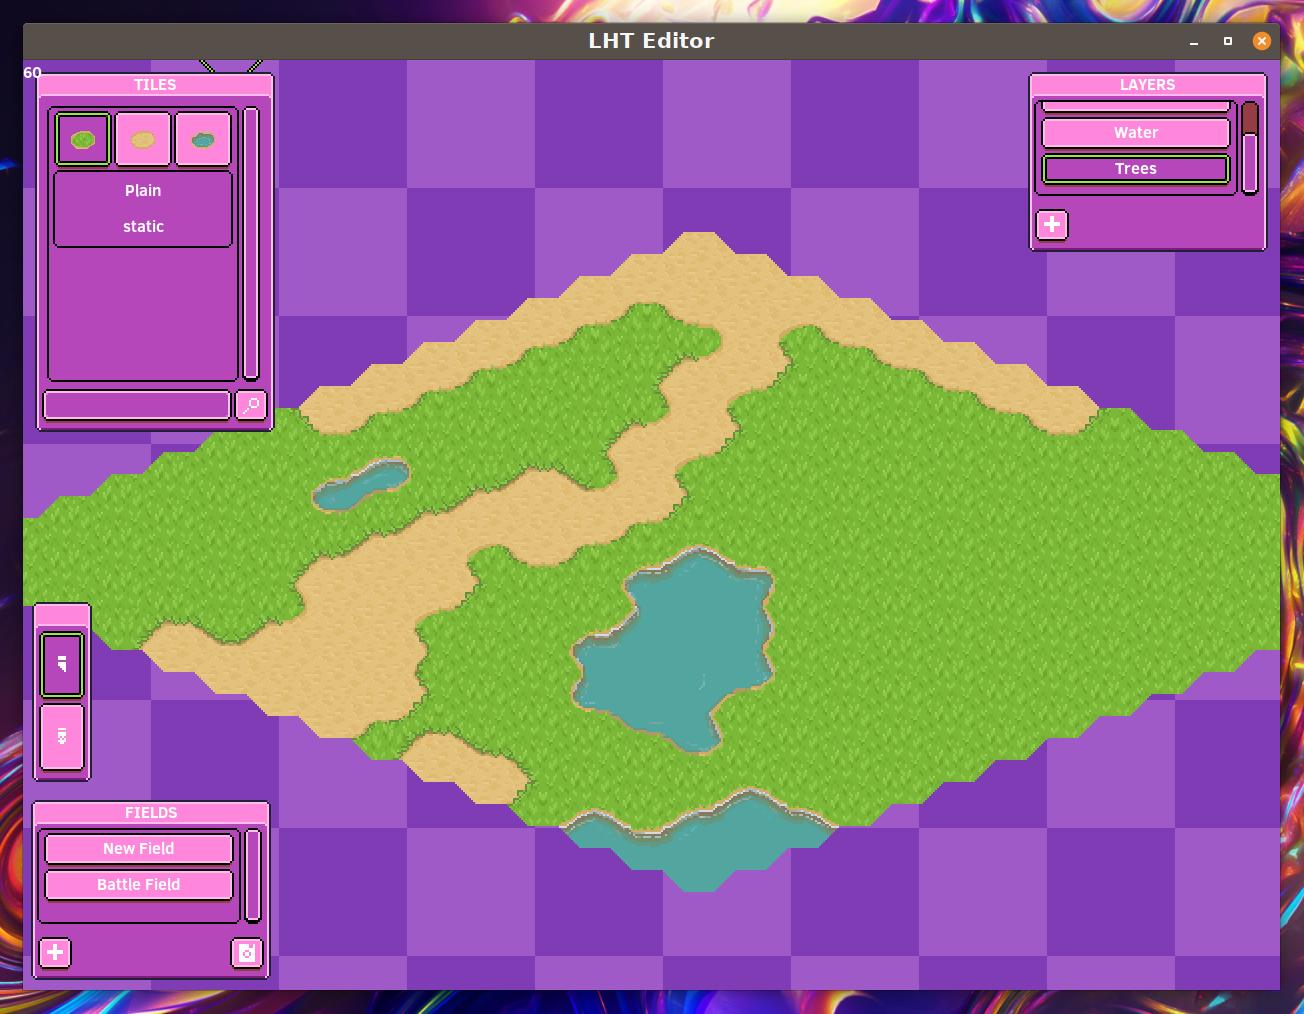 Screenshot featuring the editor UI